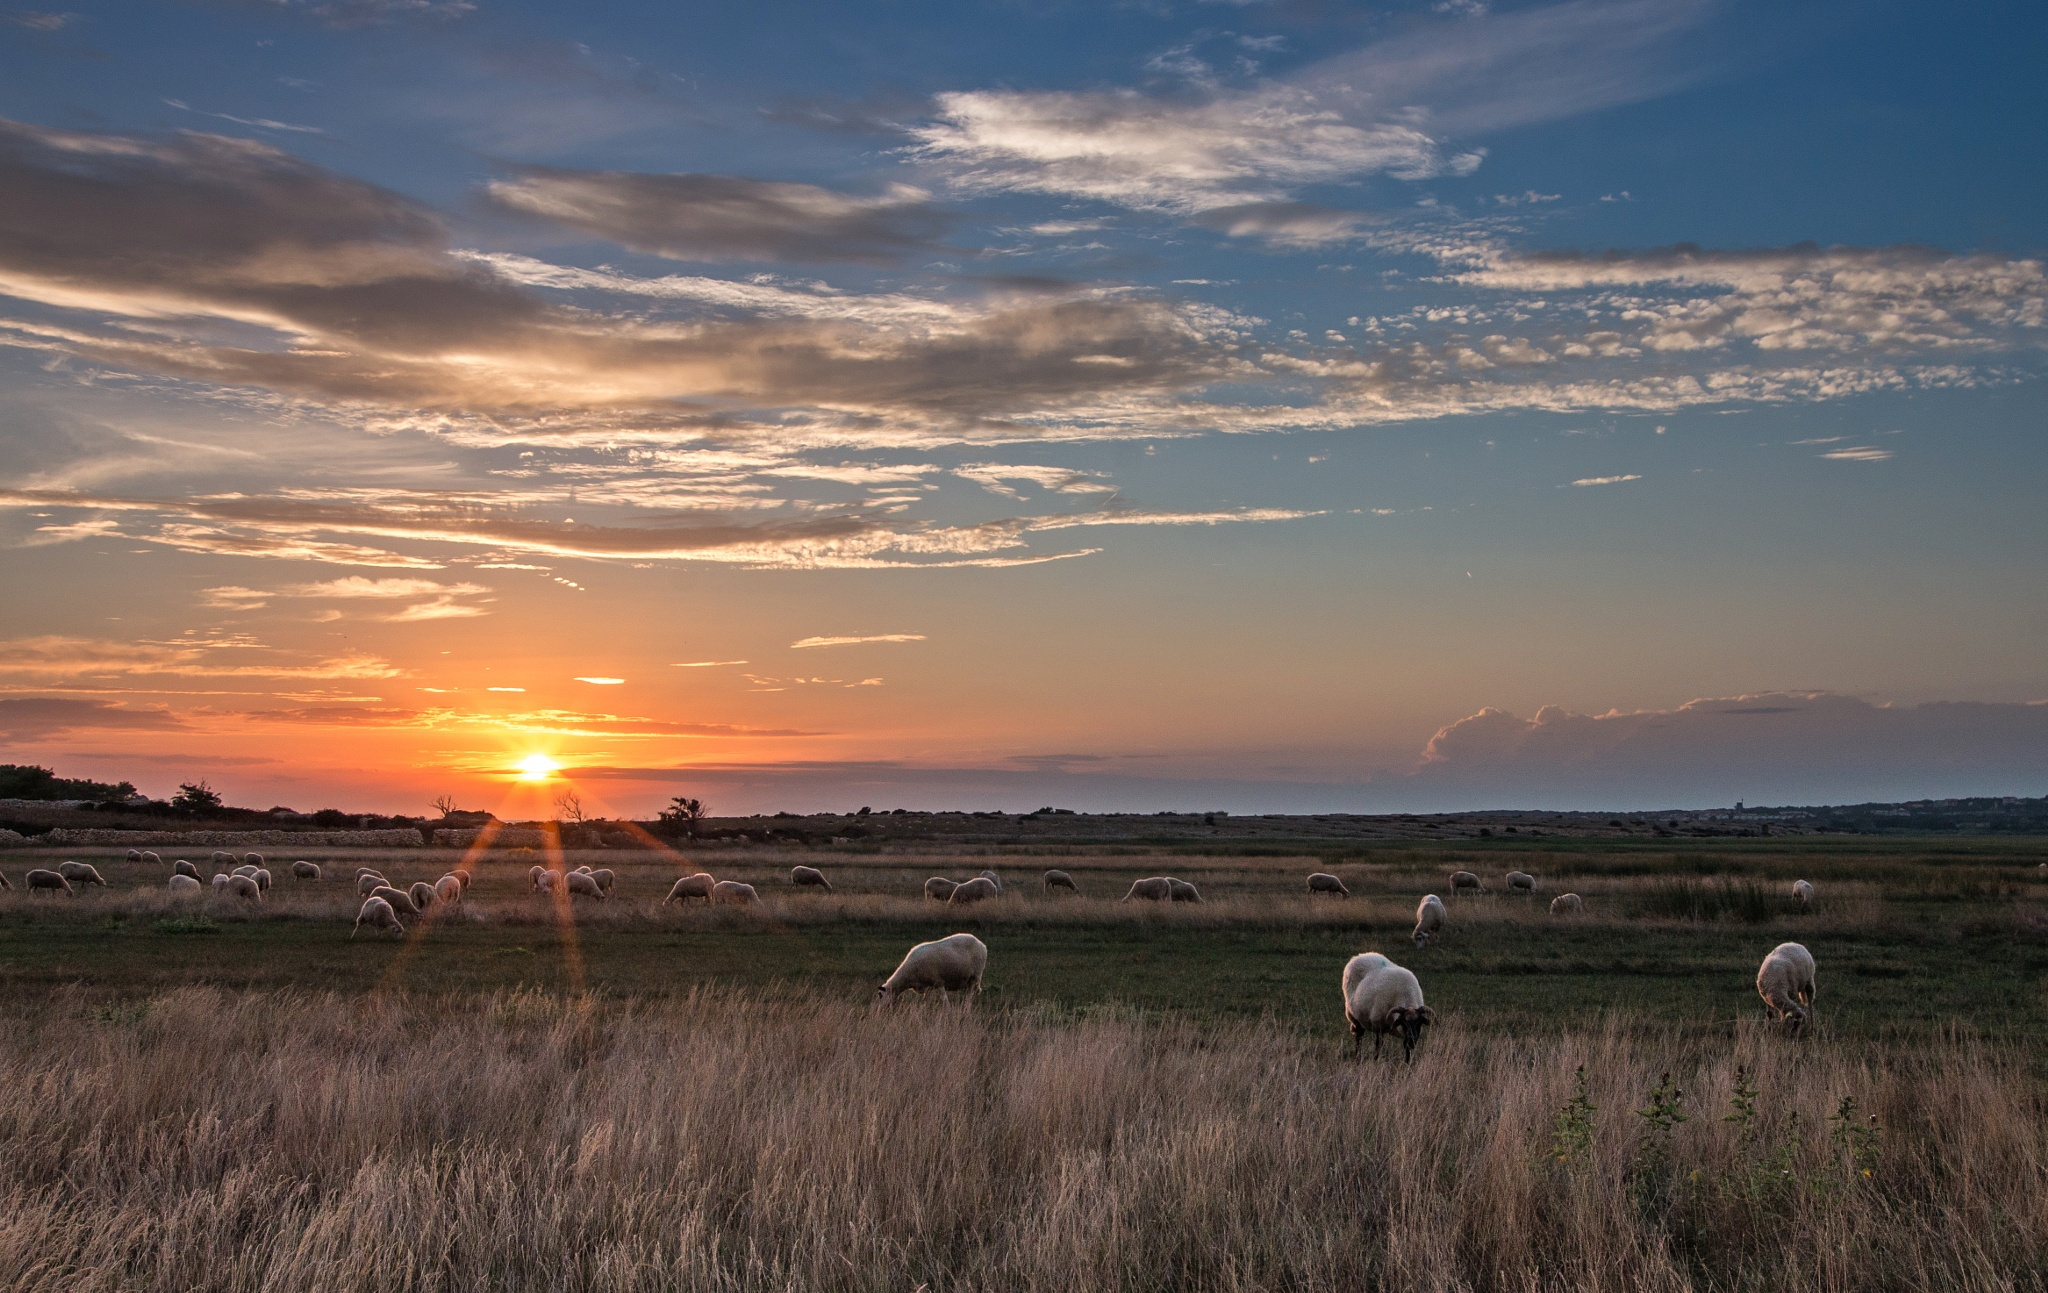 Sheep  at sunset by Zoran Rudec